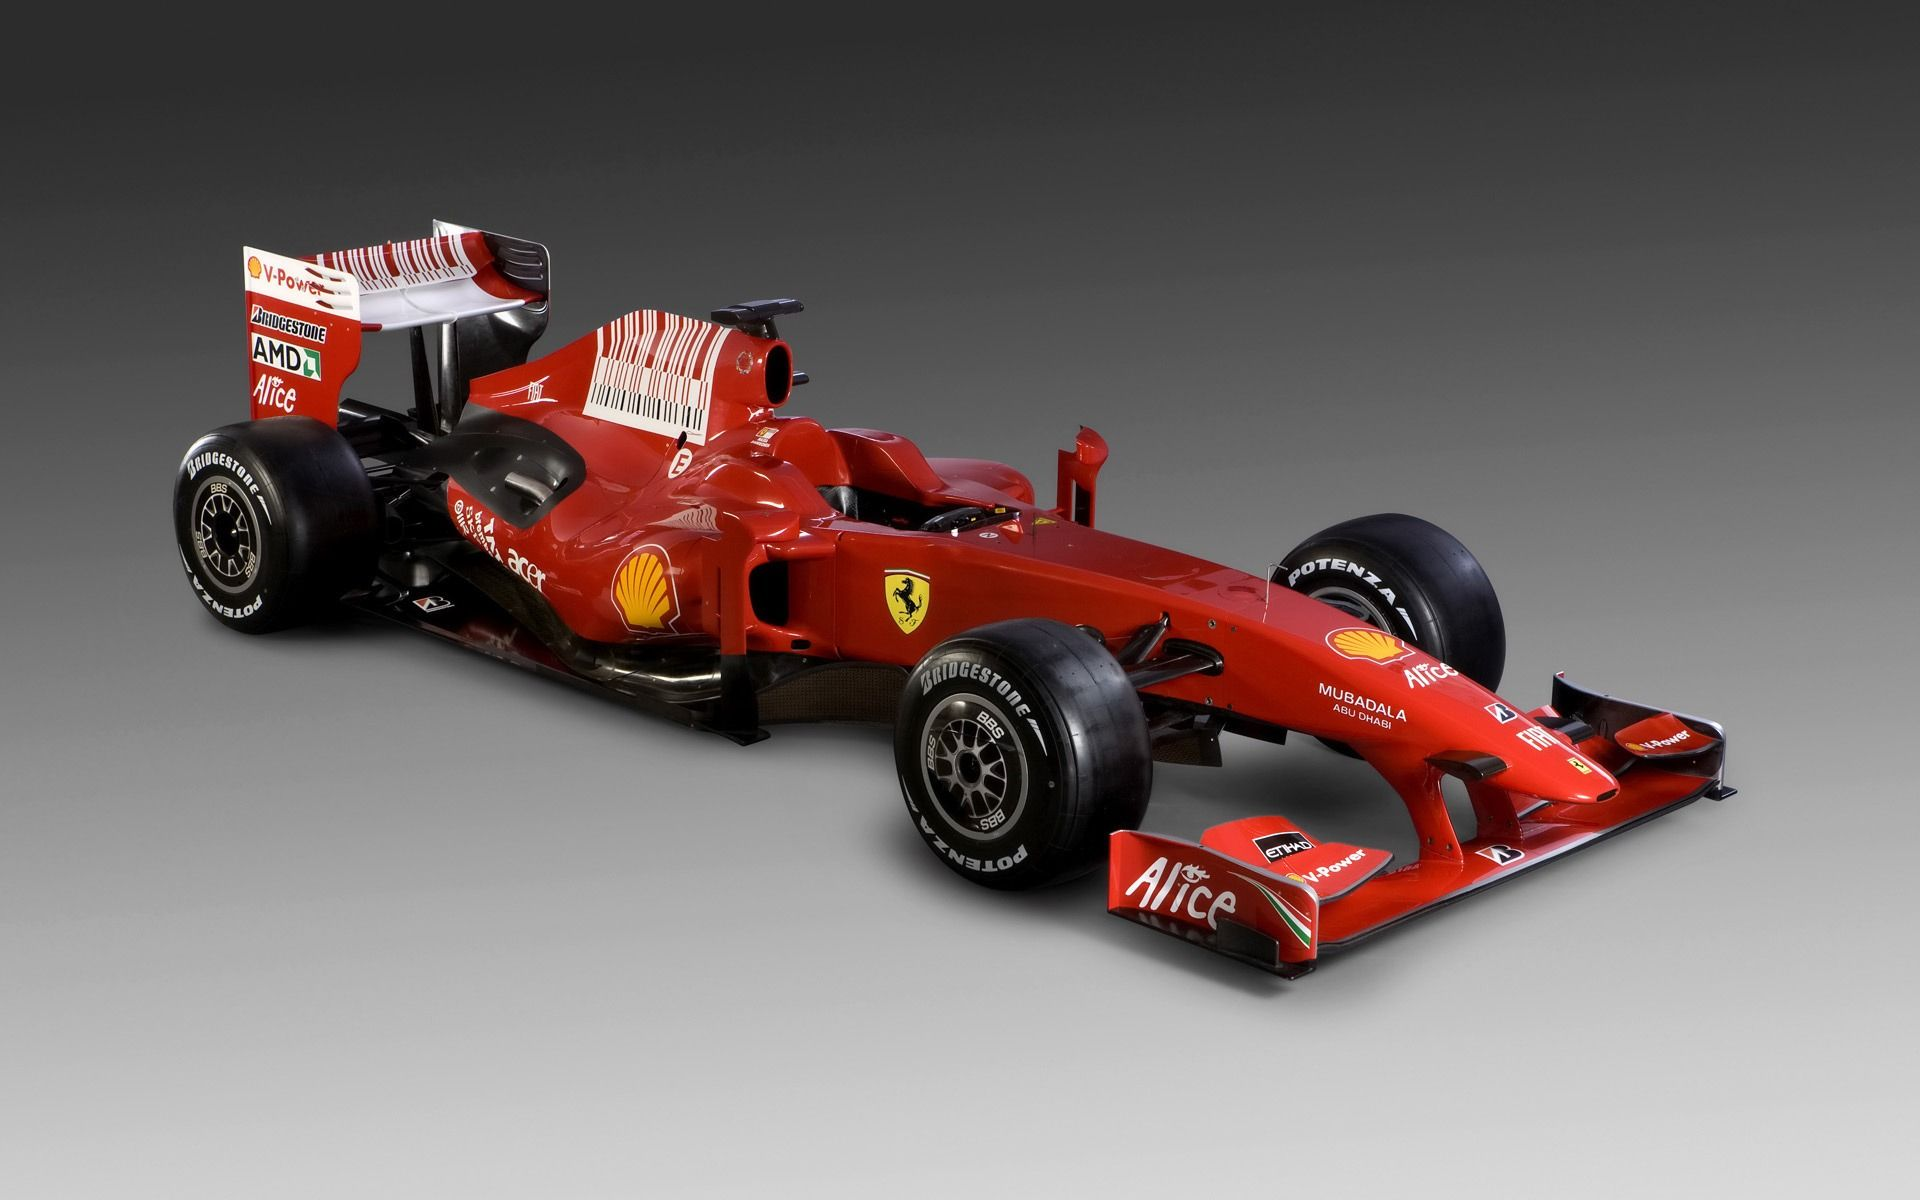 Ferrari F1 Formula One Side View Racing Ferrari F1 Car Wallpapers